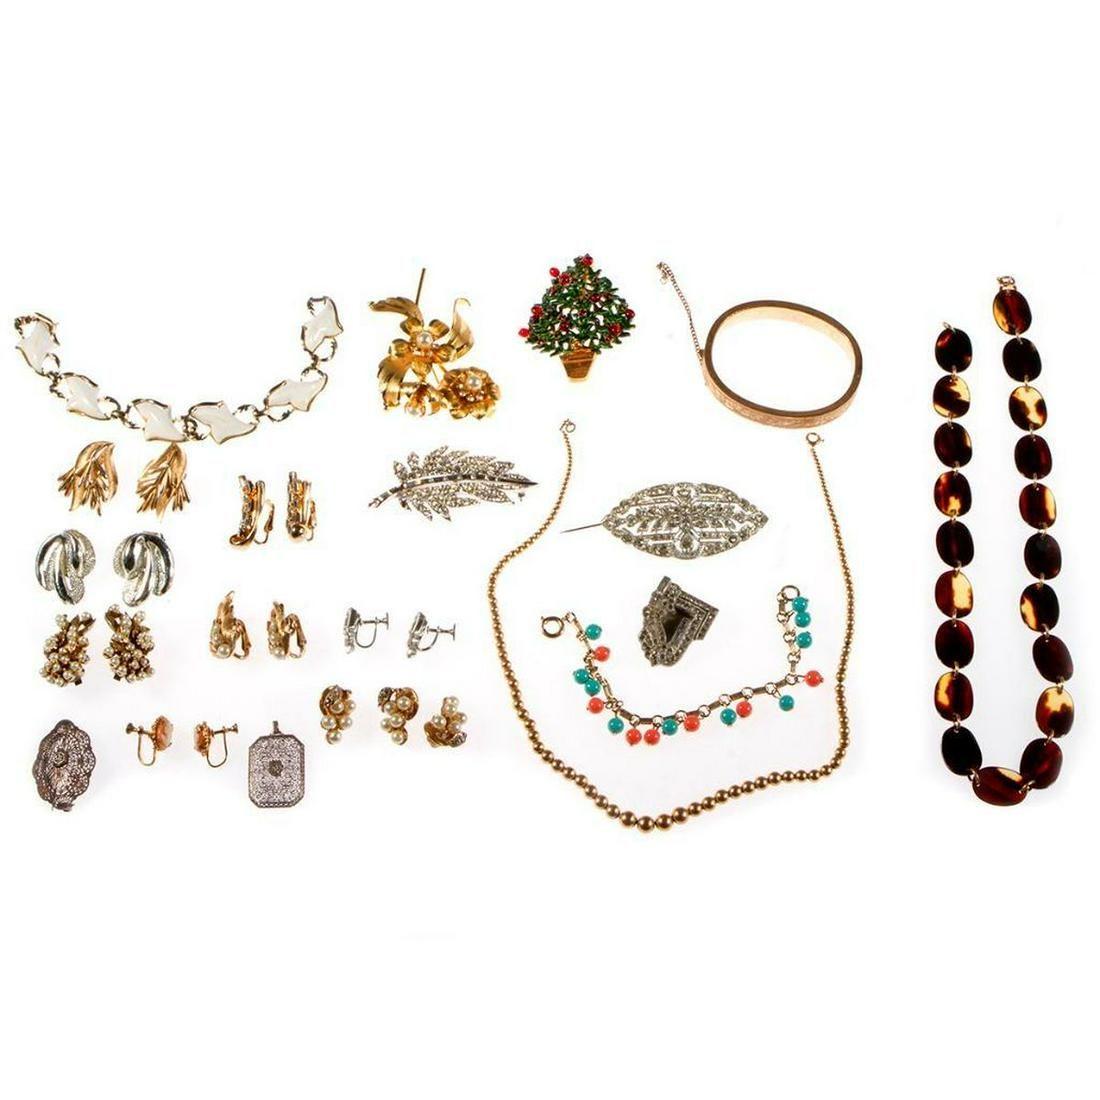 Collection of vintage rhinestone & costume jewelry